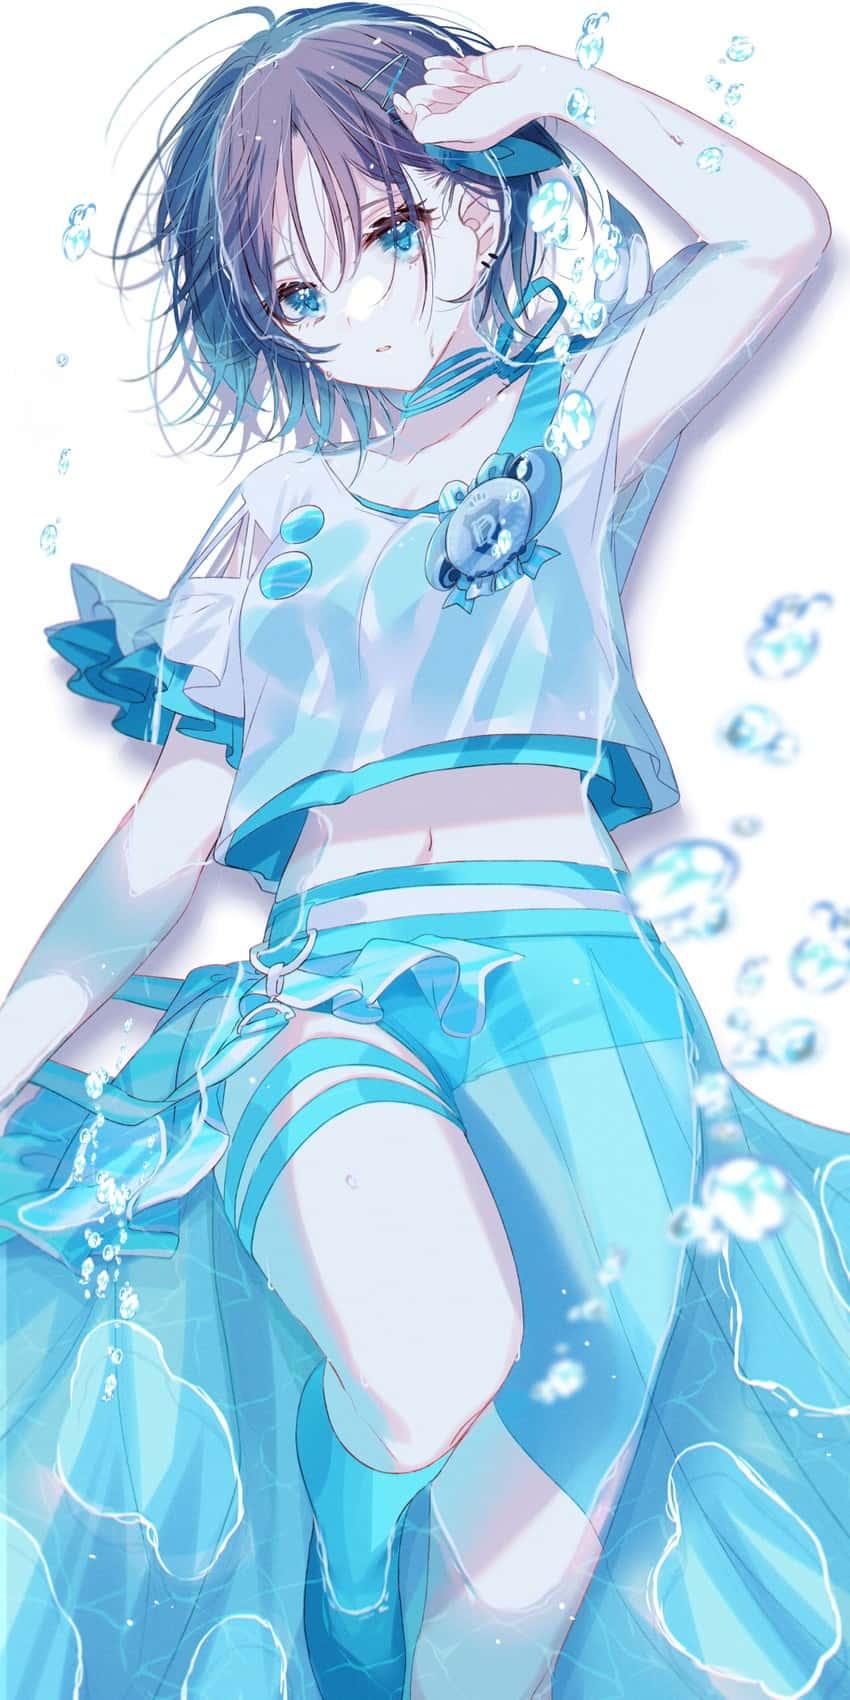 asakura tooru idolmaster127 - 【アイドルマスター】浅倉透 (あさくらとおる)ちゃんのエロ画像:イラスト その4